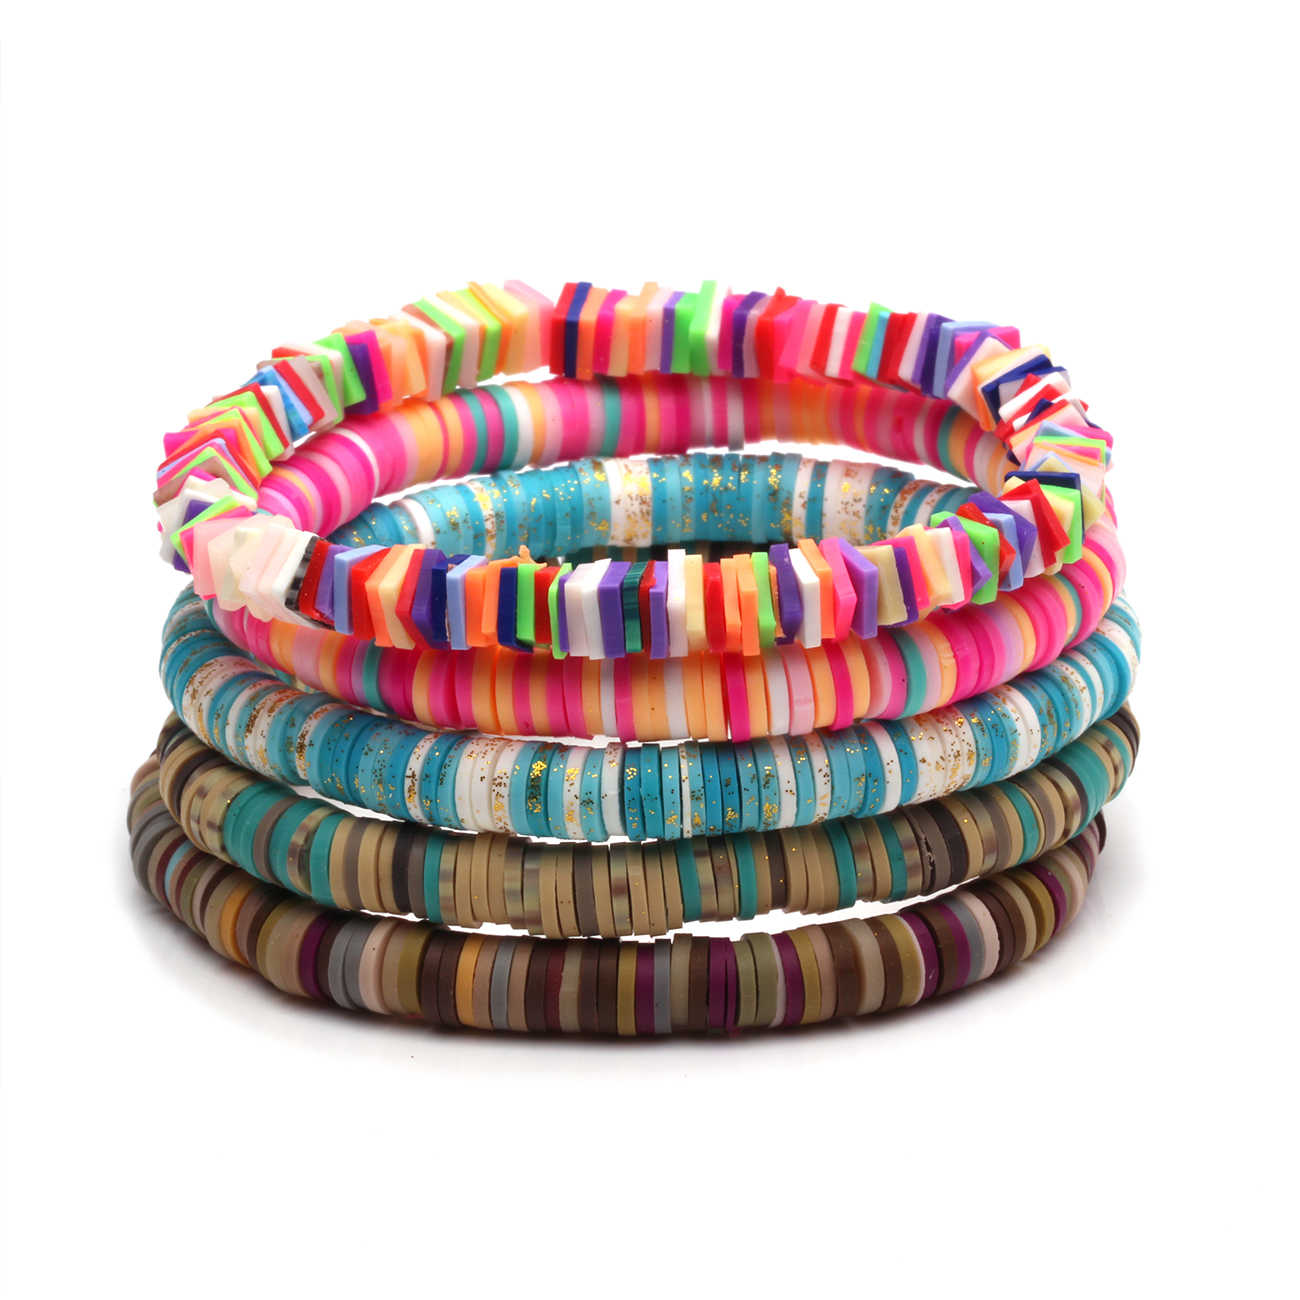 Coconut Wood Beads Bracelets African Style Vinyl Bracelets,Vinyl Stretch Bracelets,Wood Bracelets Disc Bracelets,Polymer Clay Bracelet